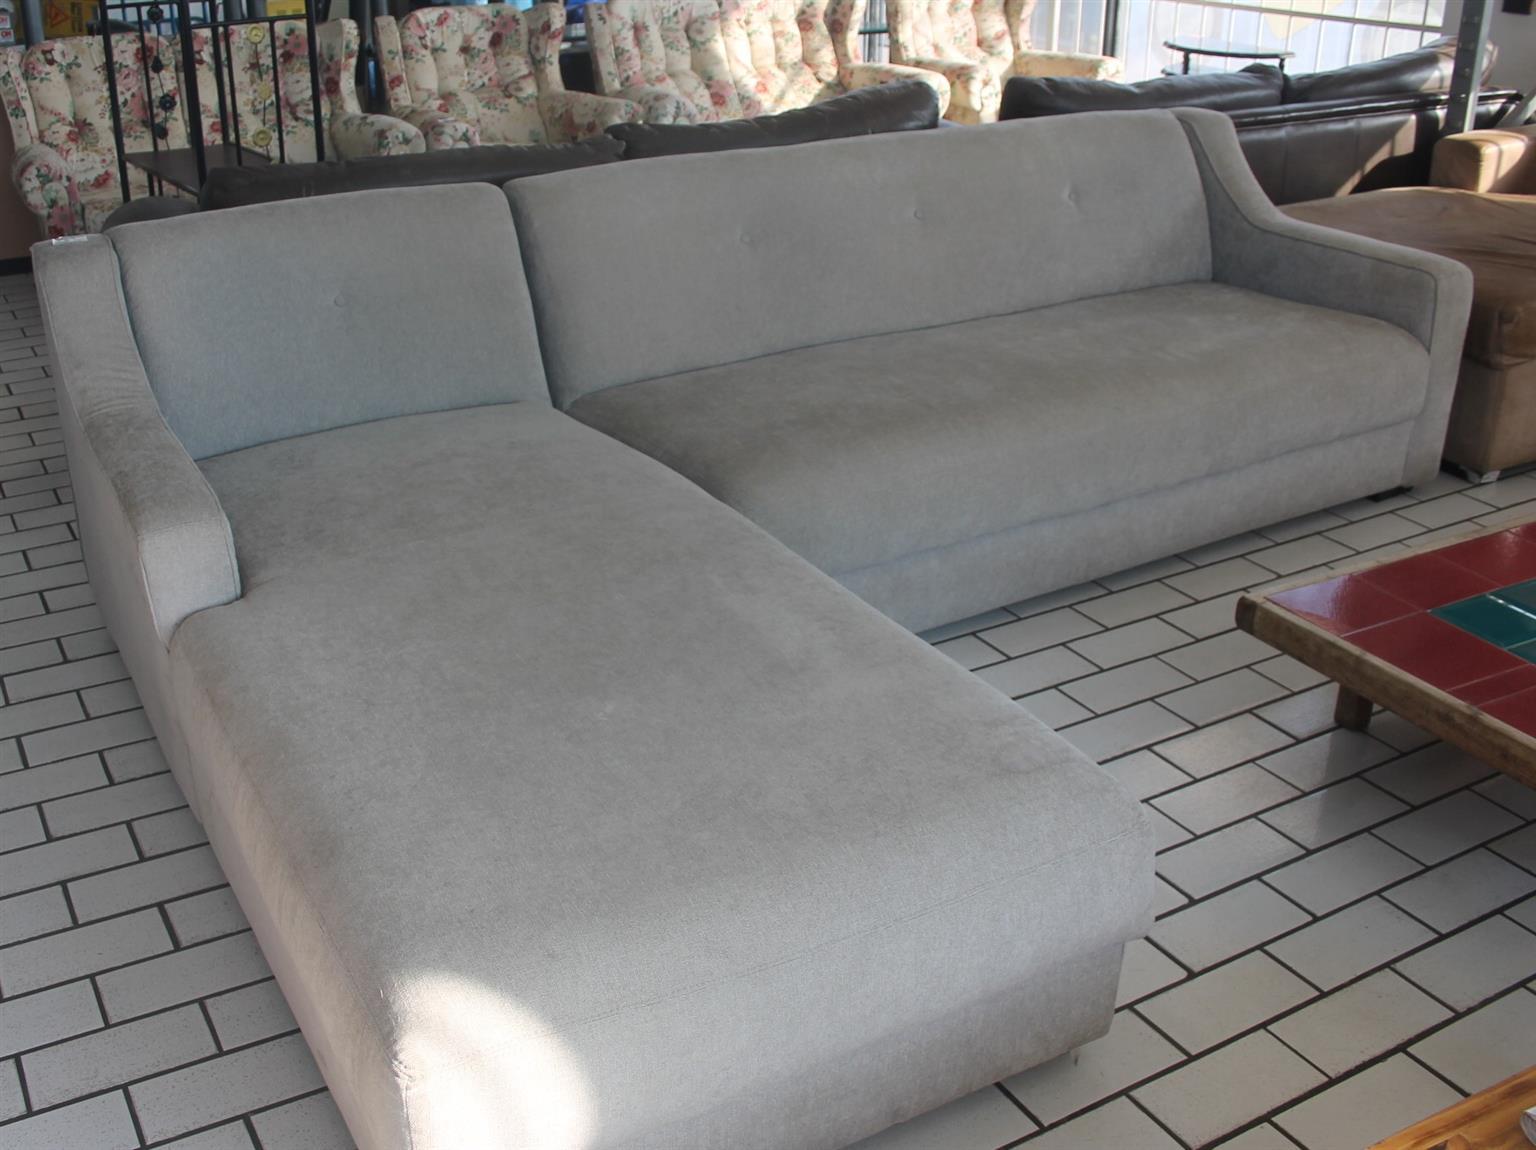 Coricraft grey l-shape couch S045820A #Rosettenvillepawnshop